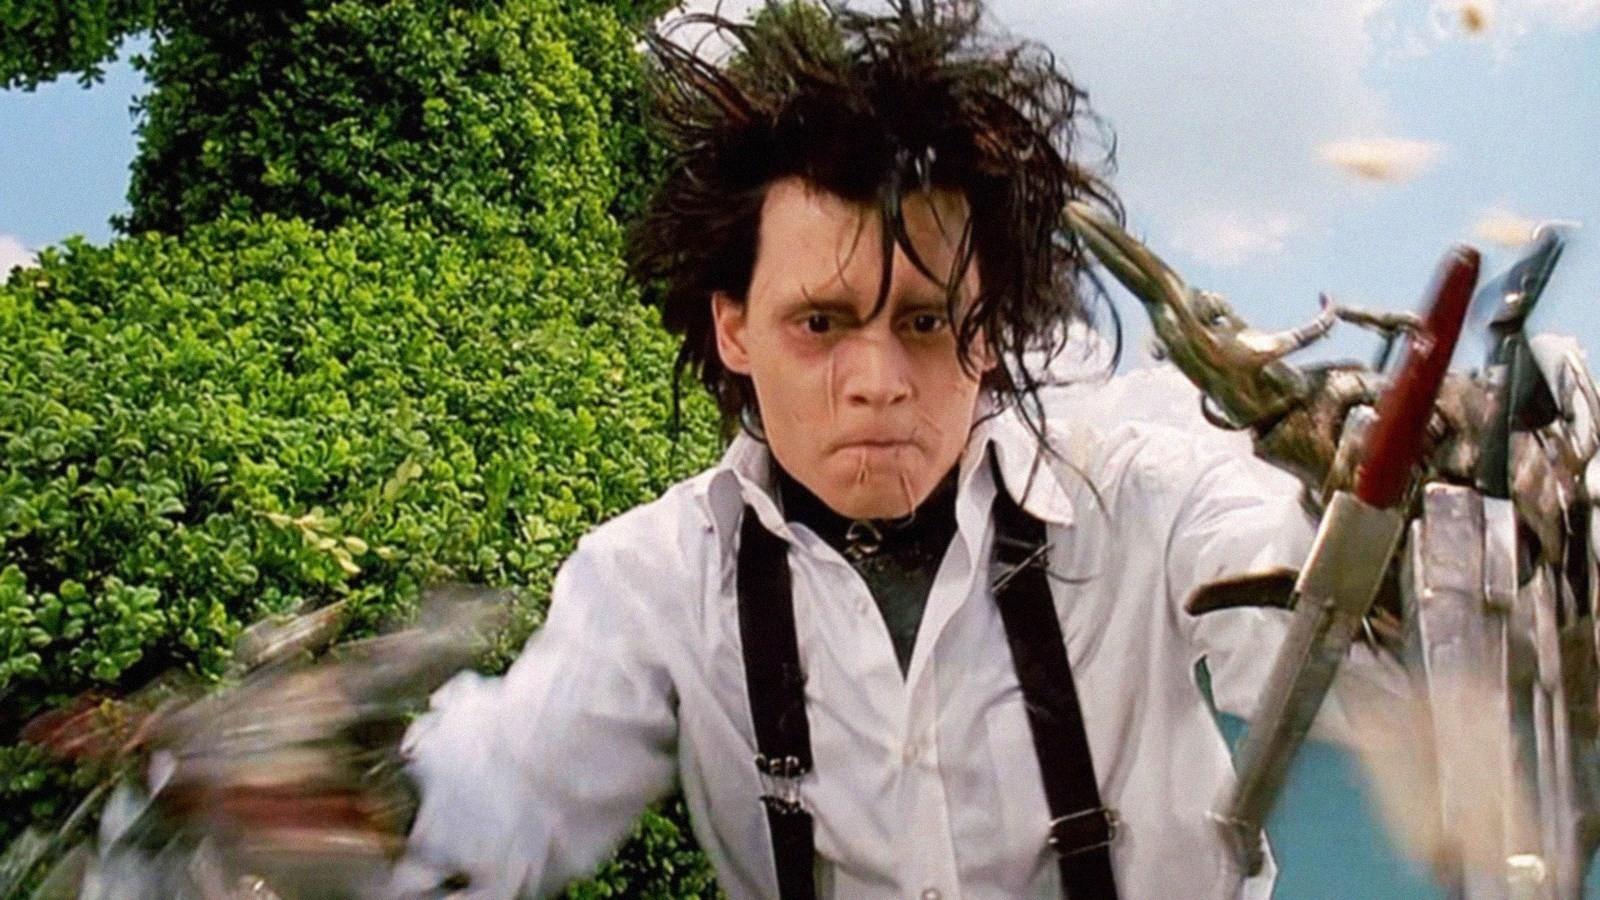 #15) Edward Scissorhands - (1990 - dir. Tim Burton)